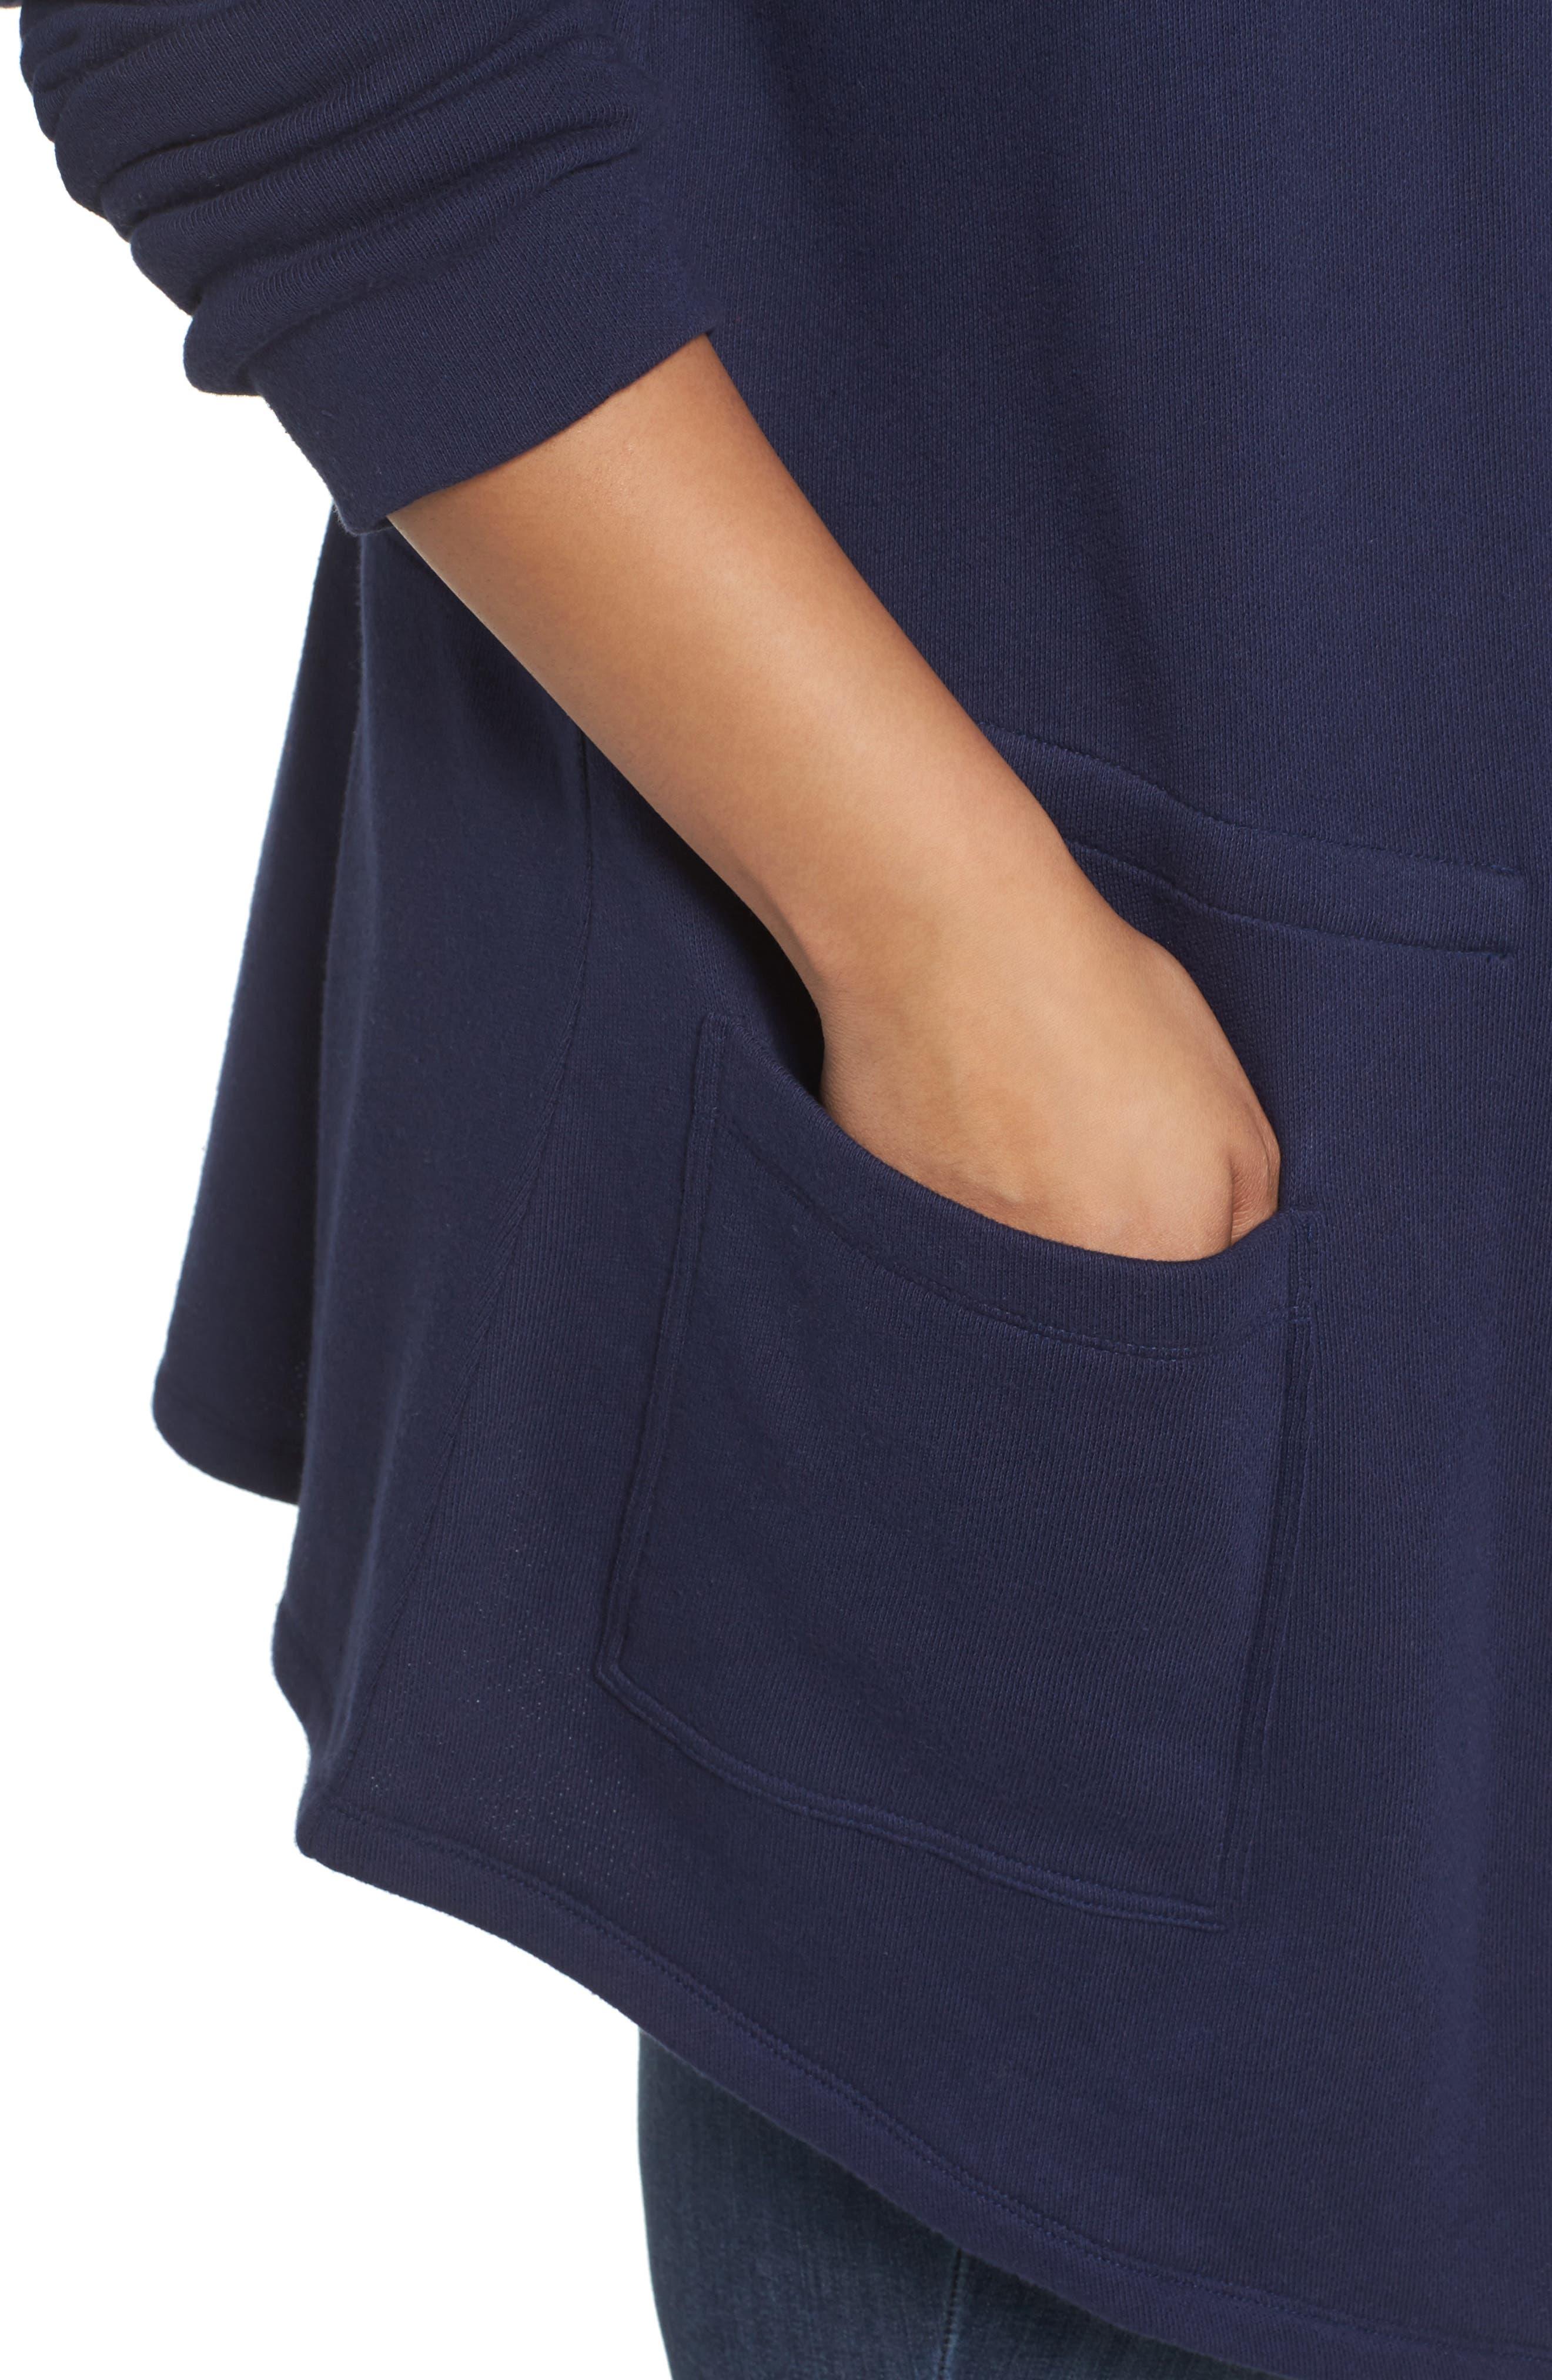 Knit Drape Front Jacket,                             Alternate thumbnail 4, color,                             Navy Peacoat